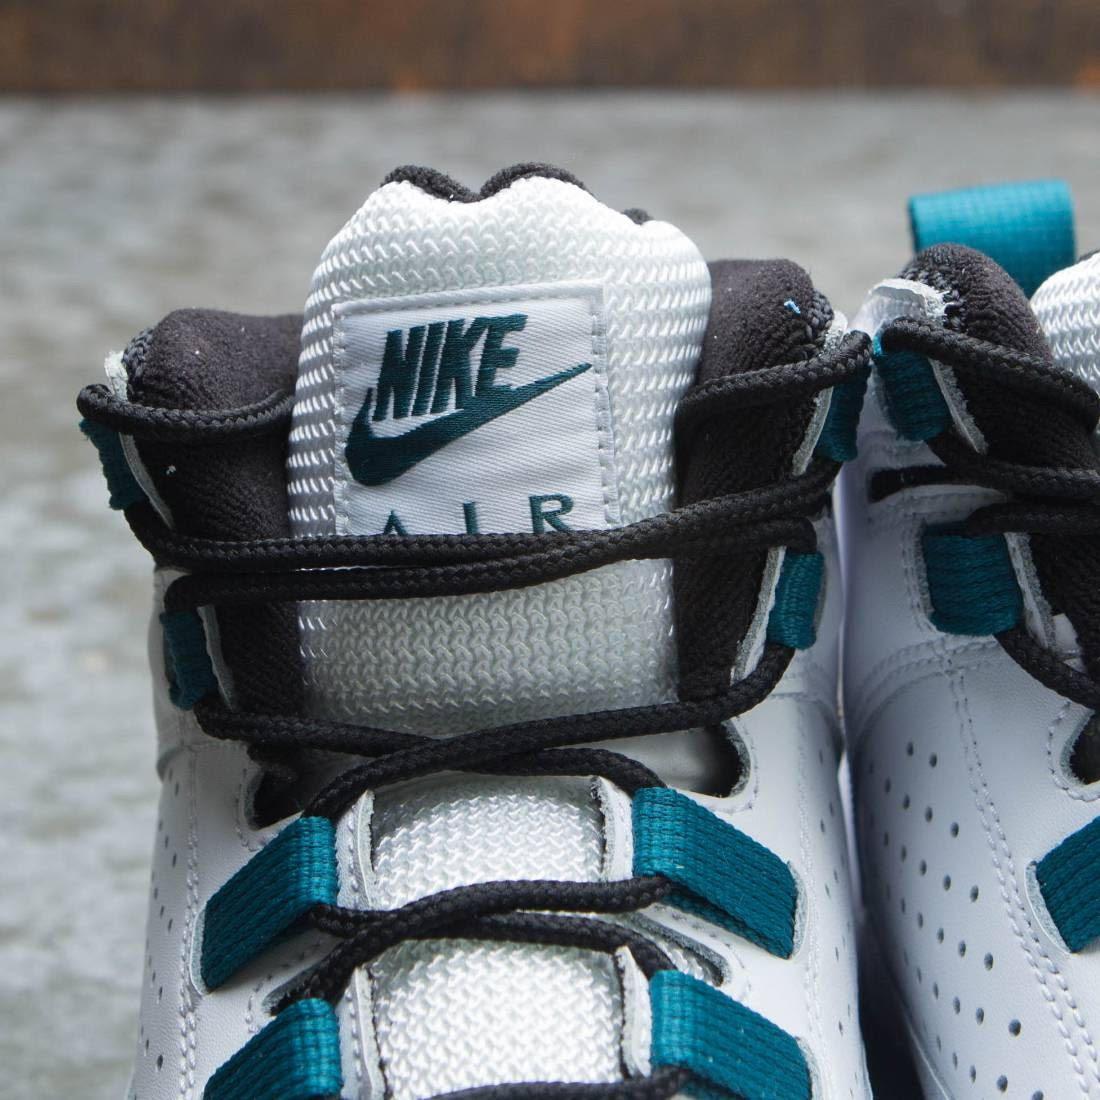 official photos b2b43 ff417 Nike-Air-Darwin-OG-White-Teal-Black-2